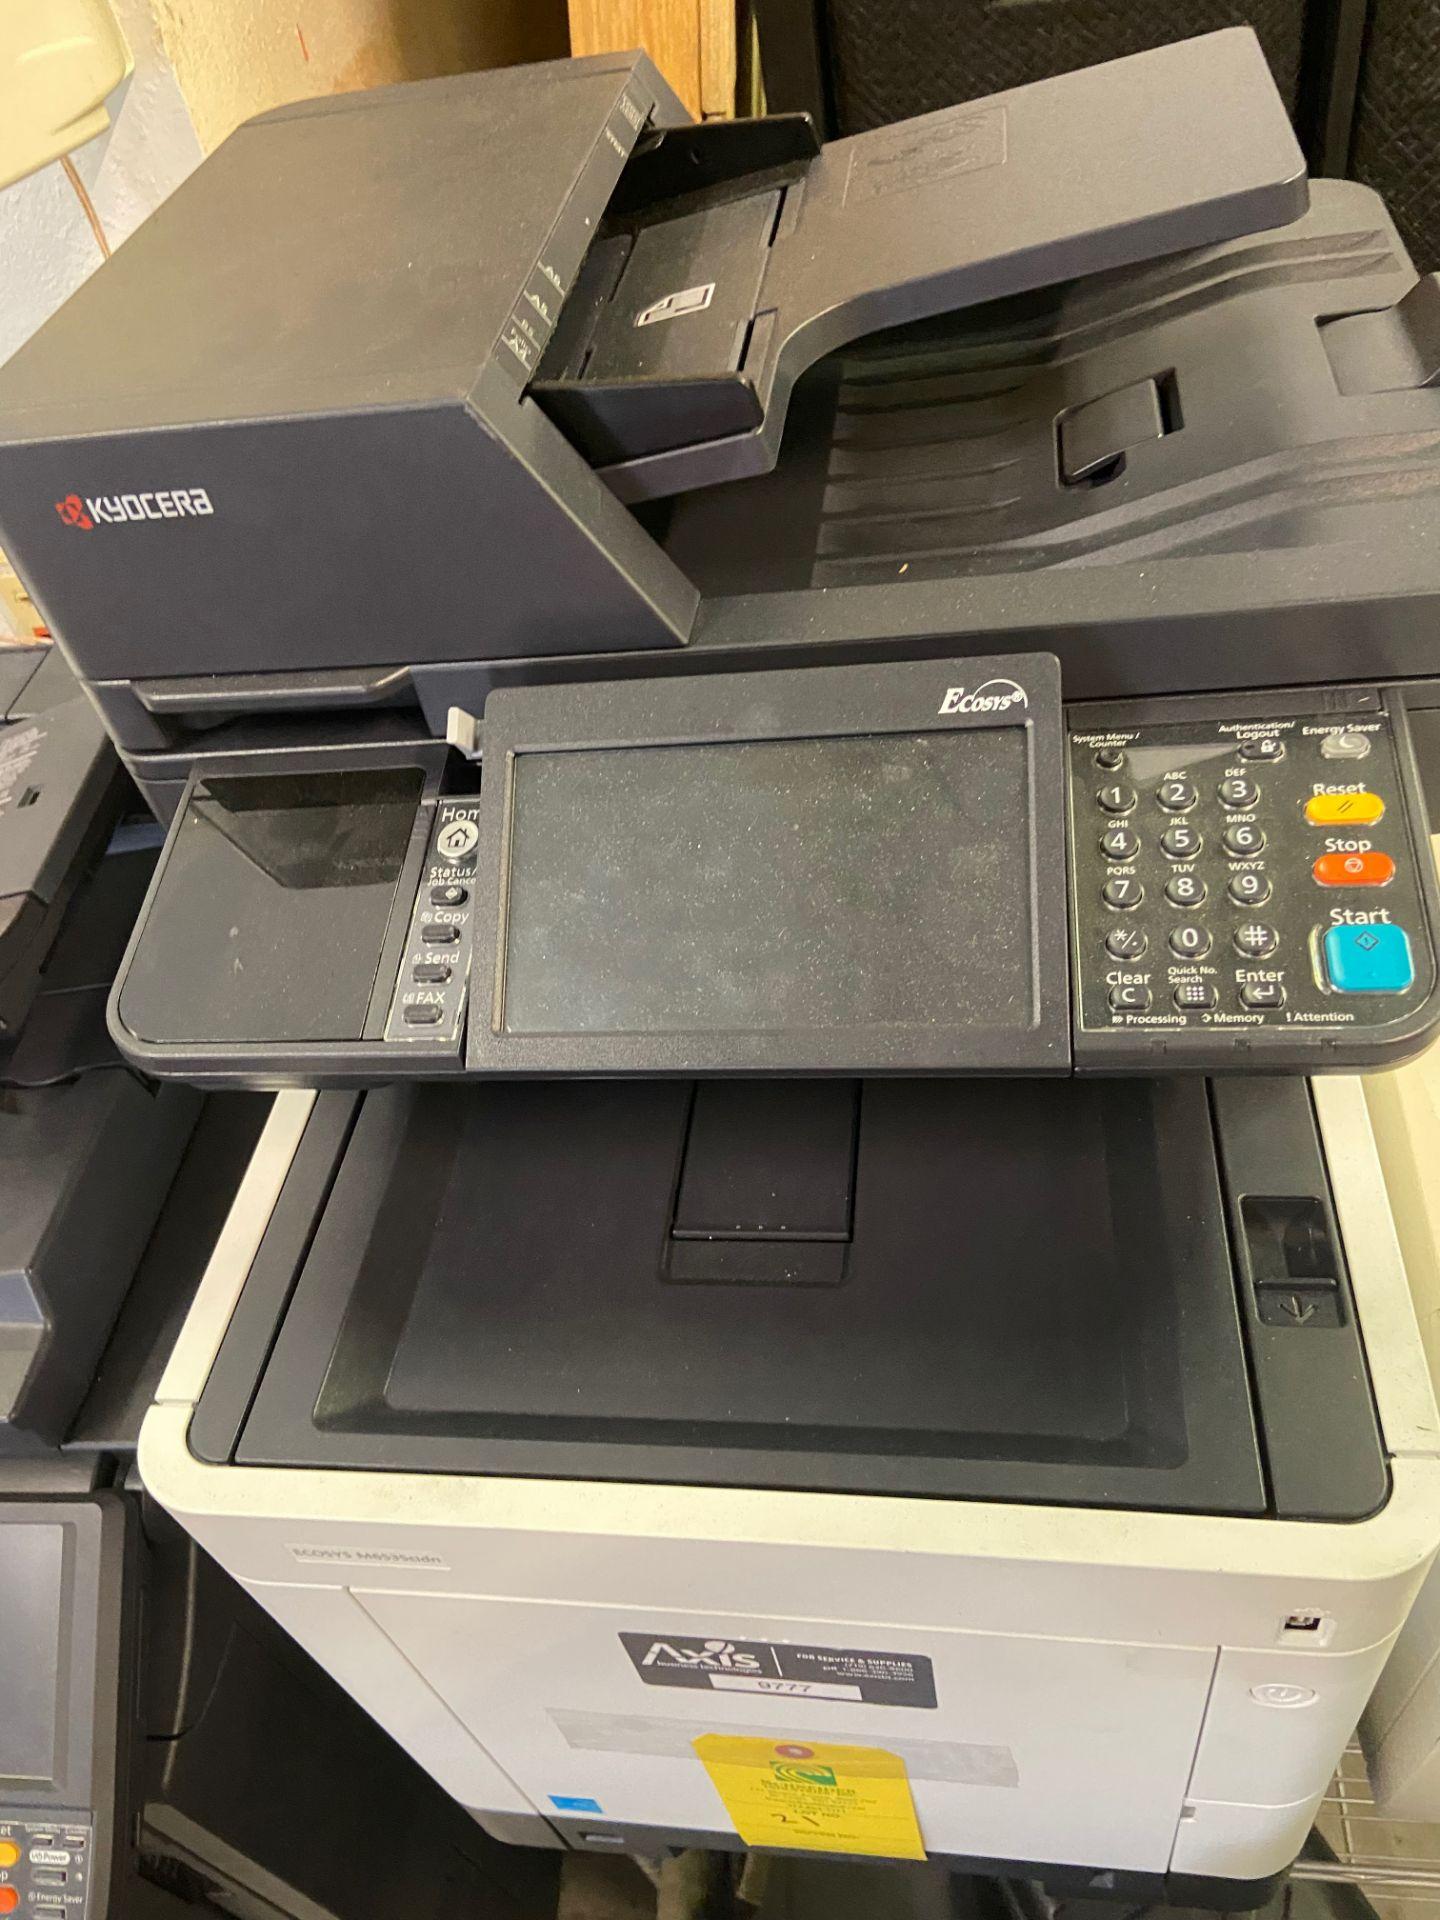 Kyocera Ecosys Printer, Model# M6535cidn, 120V, 60 Hz, Loading/Removal Fee: $20 - Image 3 of 6